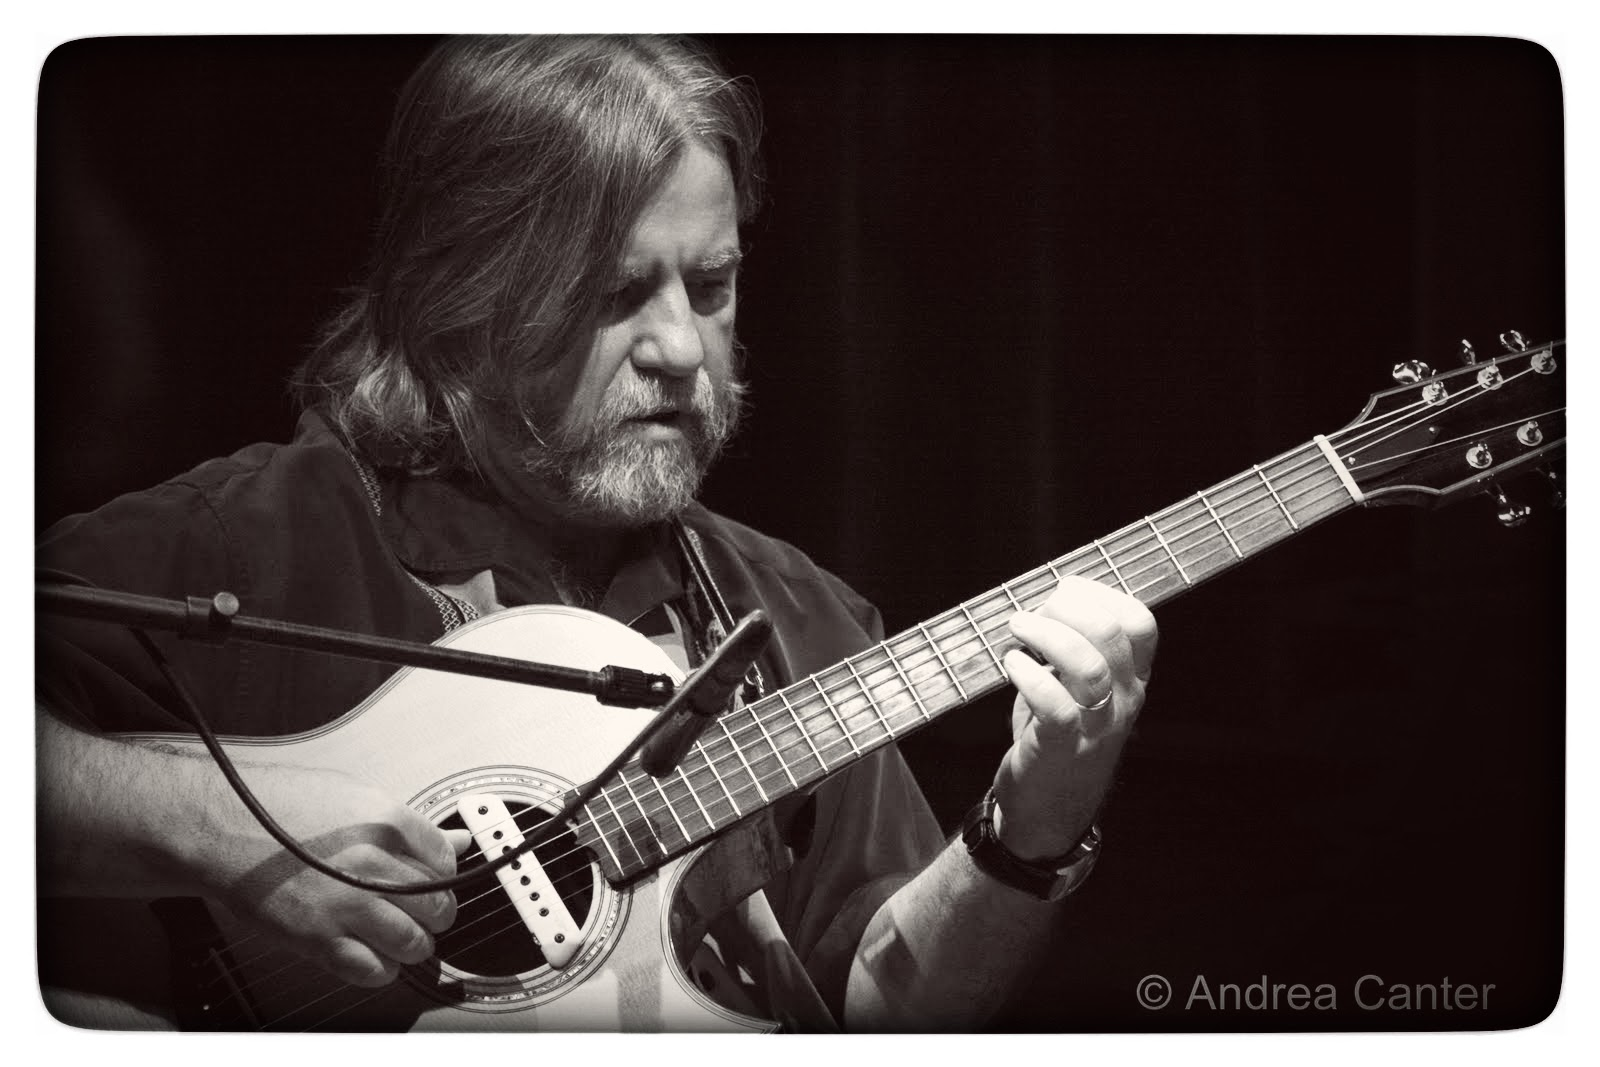 Prepared Guitar Tim Sparks 13 Questions